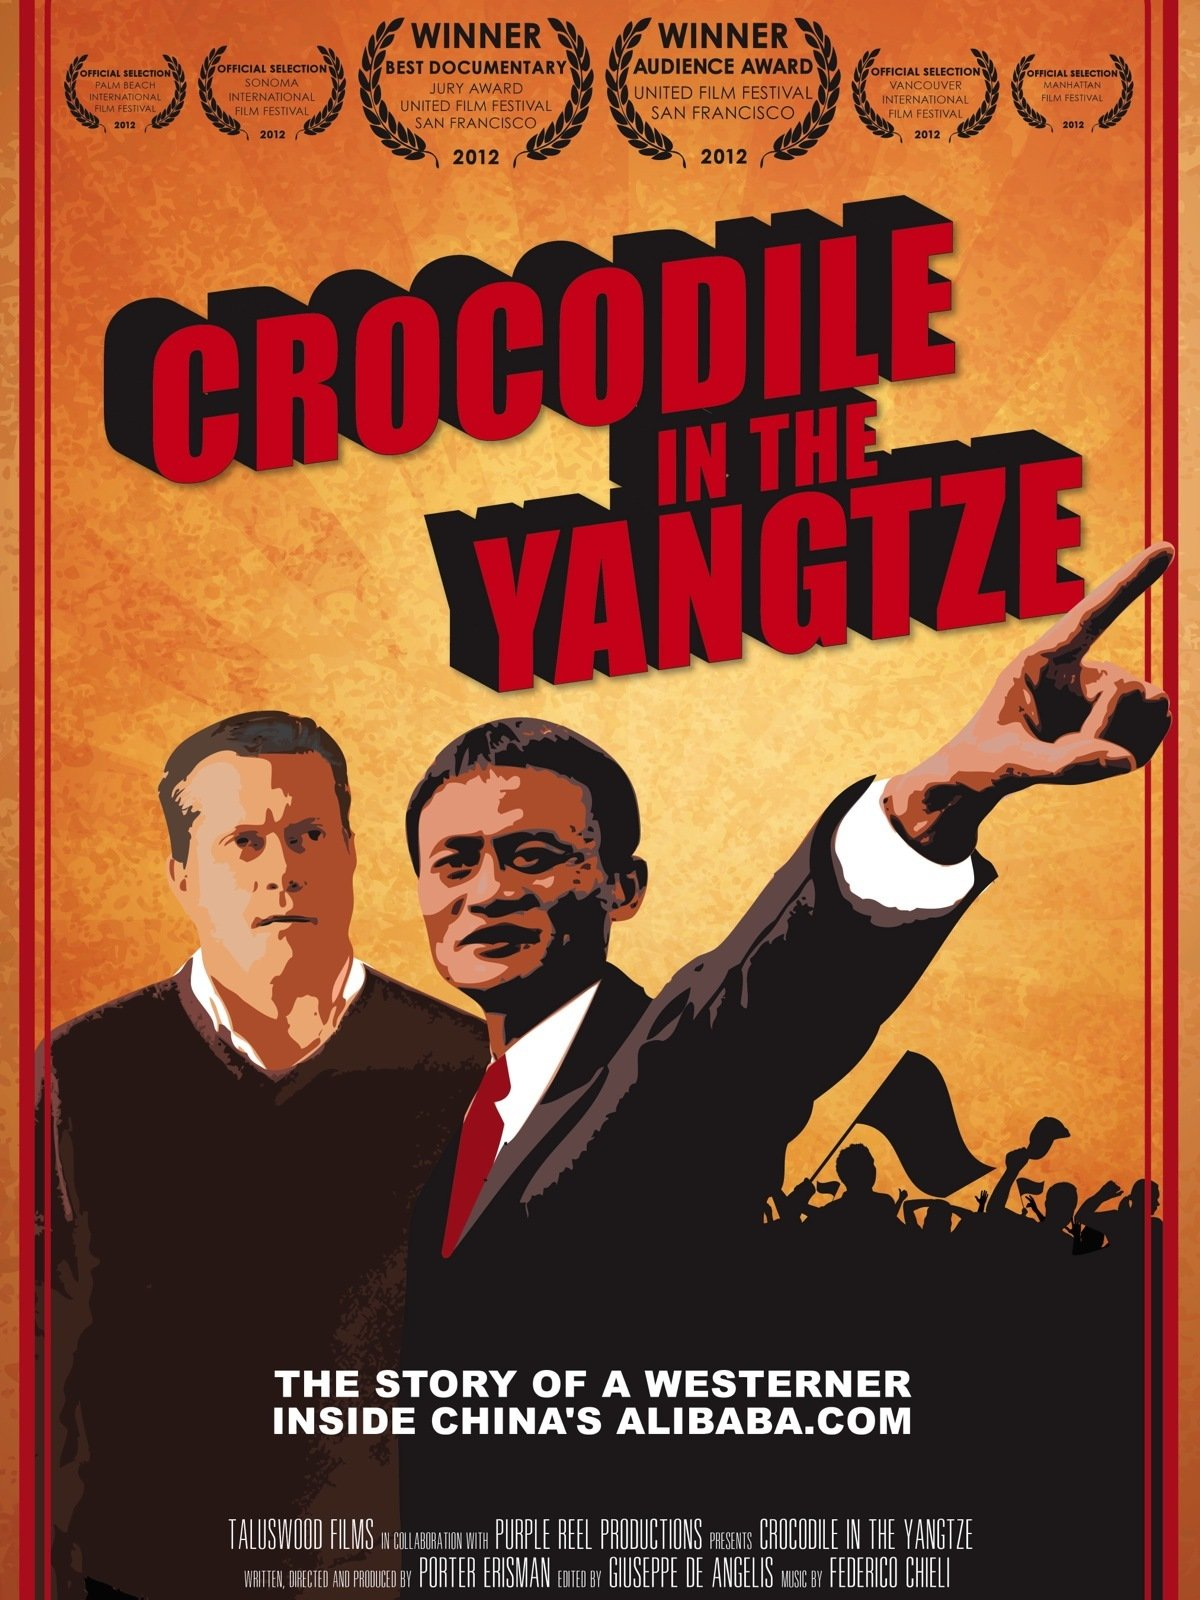 Amazon. Com: watch the alibaba story crocodile in the yangtze.